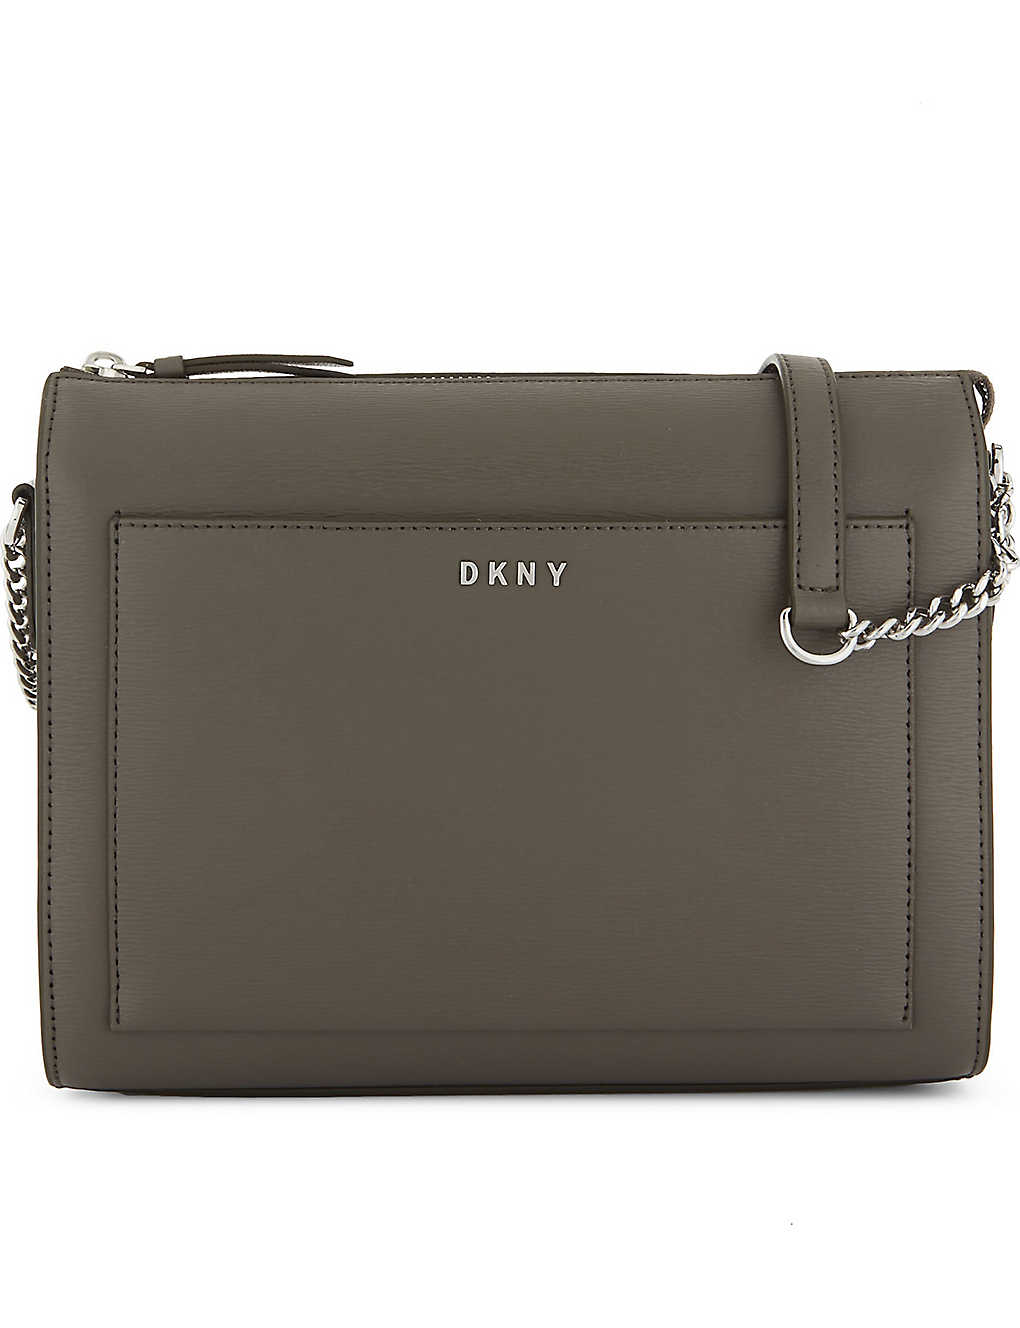 97c7d97118d6 DKNY - Bryant medium leather cross-body bag | Selfridges.com